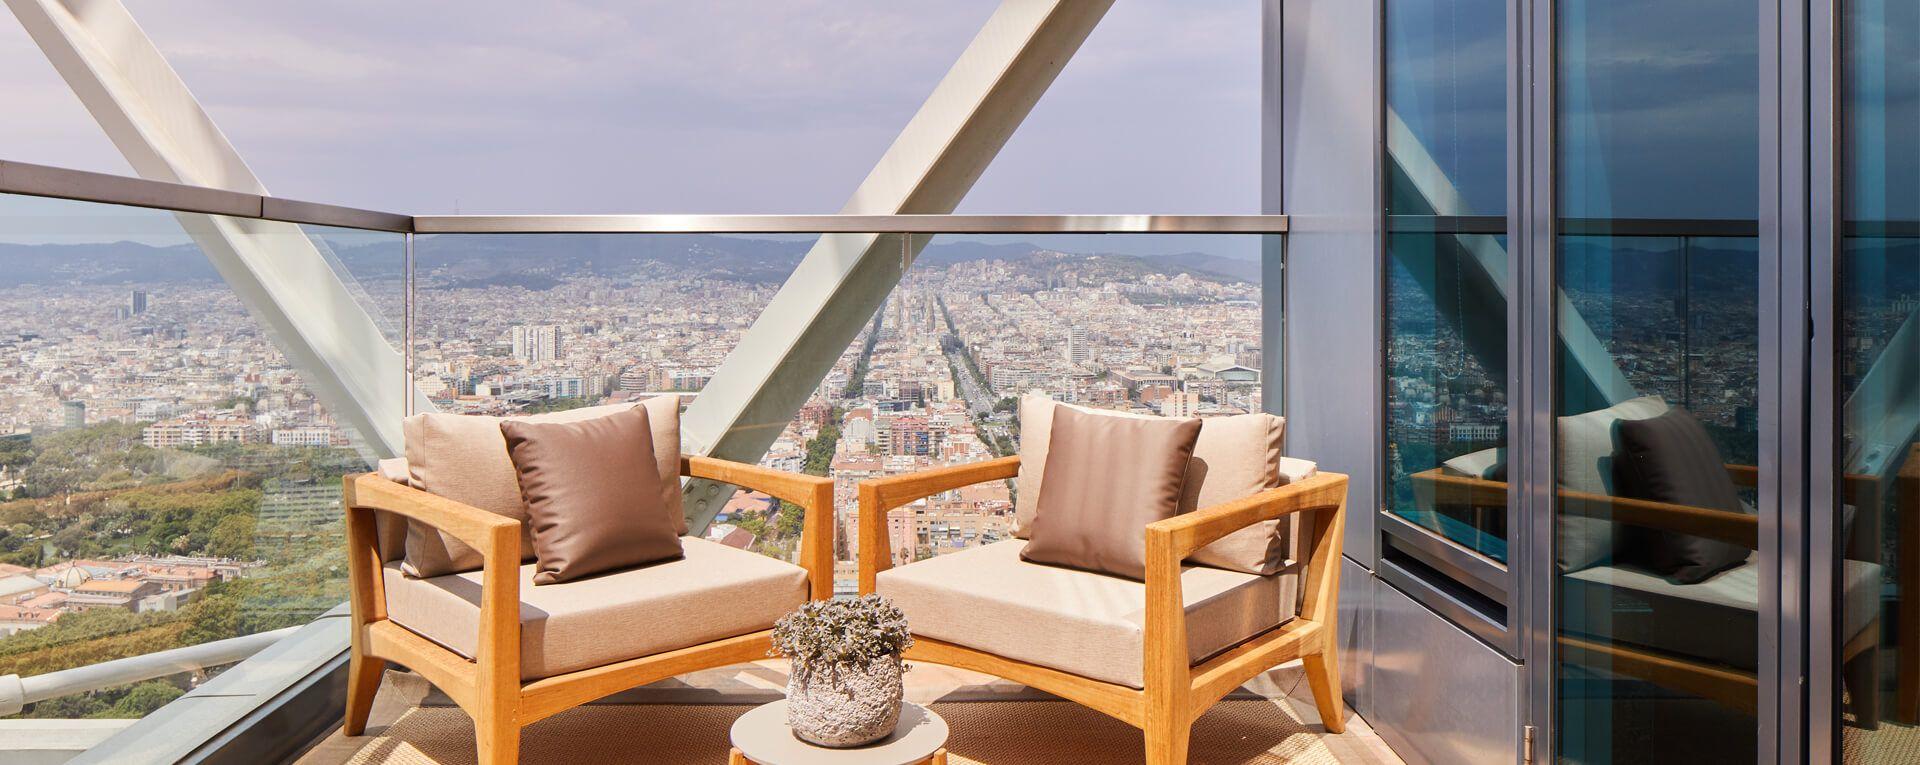 Hotel Arts Barcelona, Barcelona